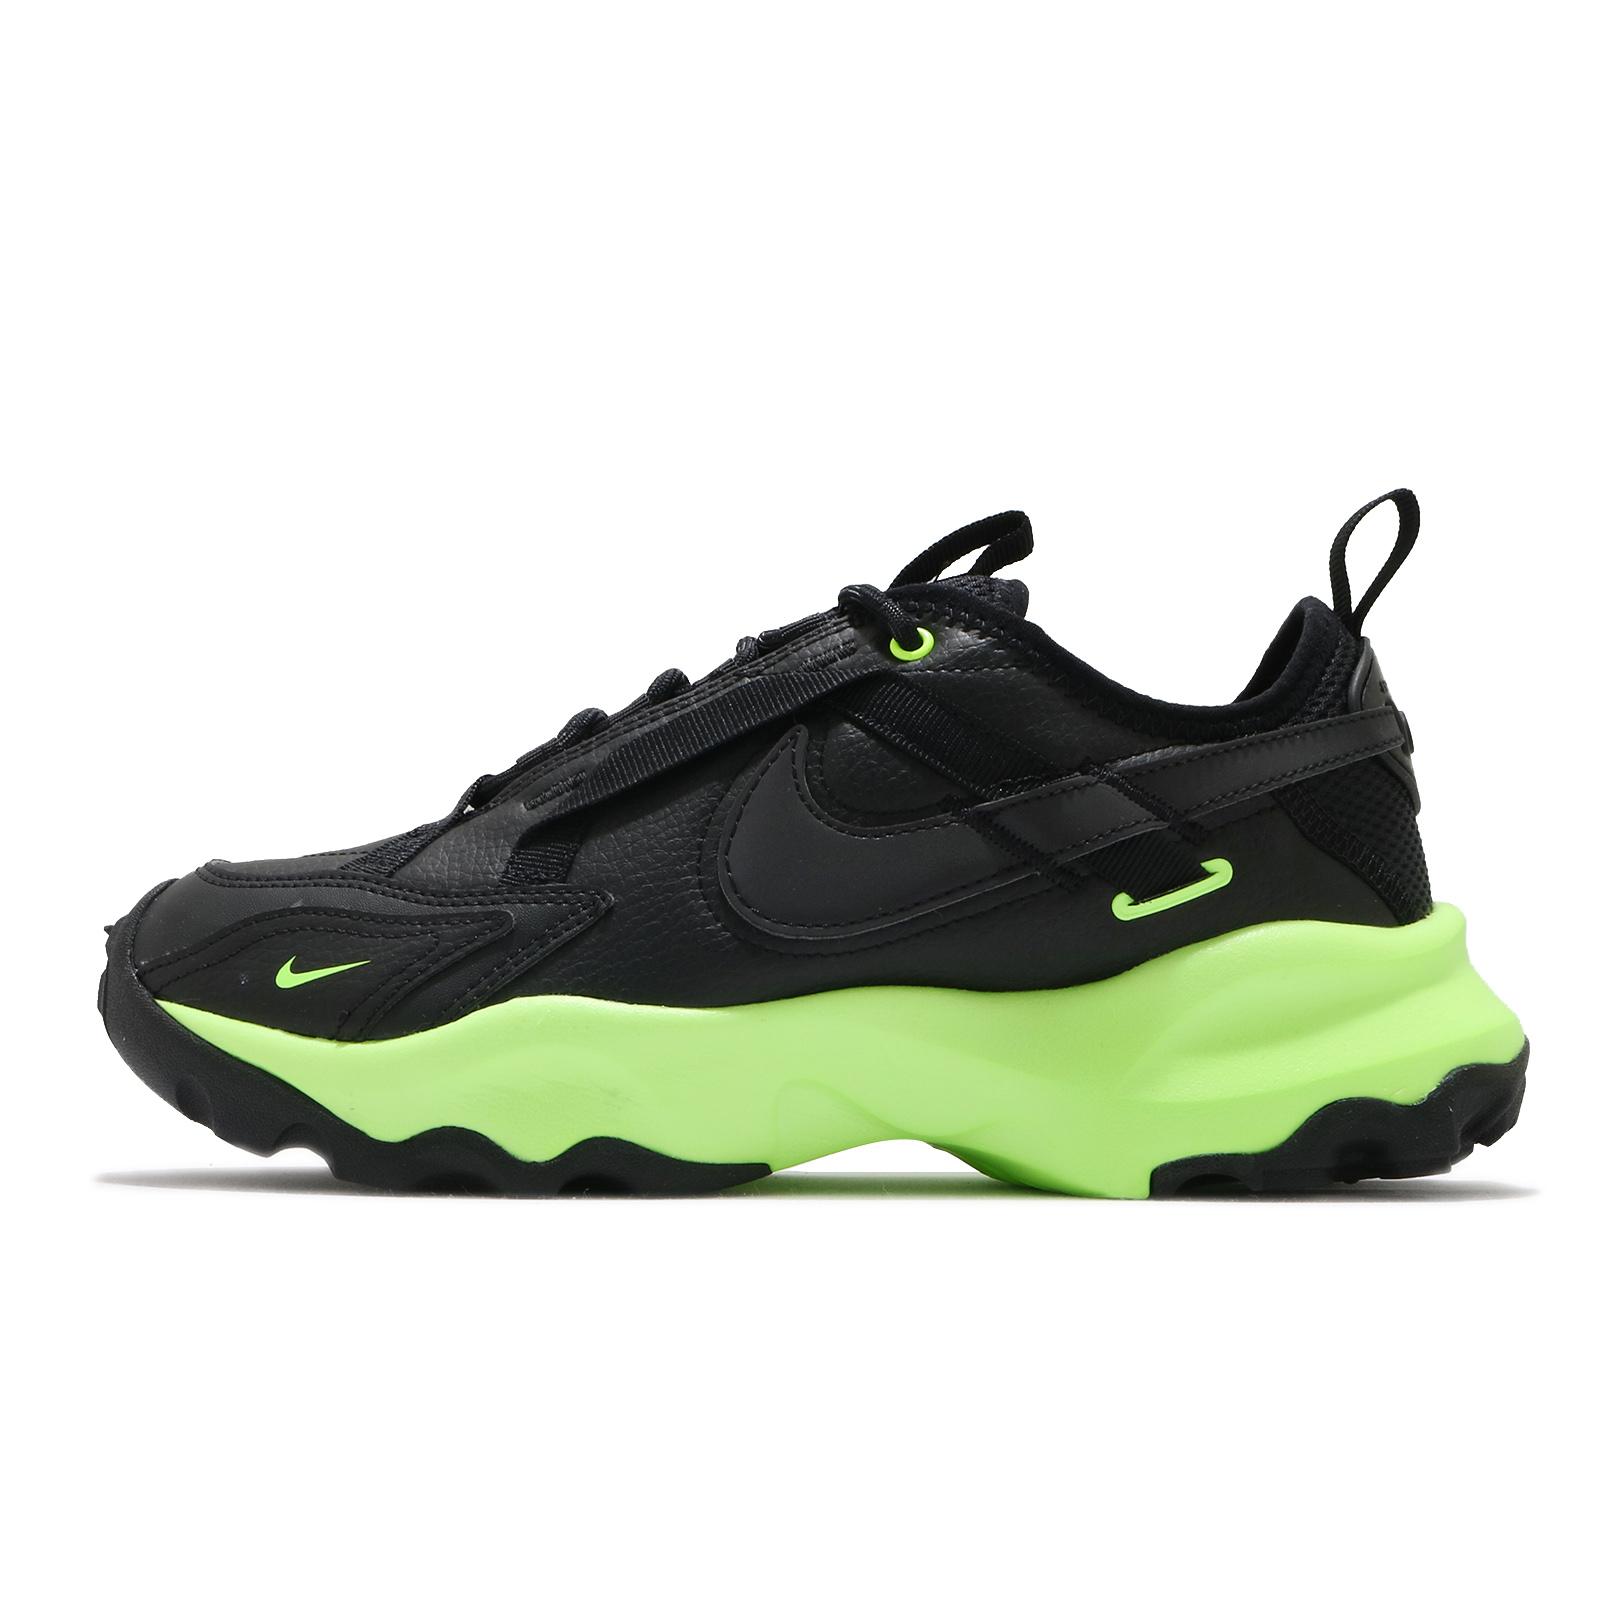 Nike 休閒鞋 Wmns TC 7900 黑 綠 微厚底 增高 女鞋 運動鞋【ACS】 DD9681-001